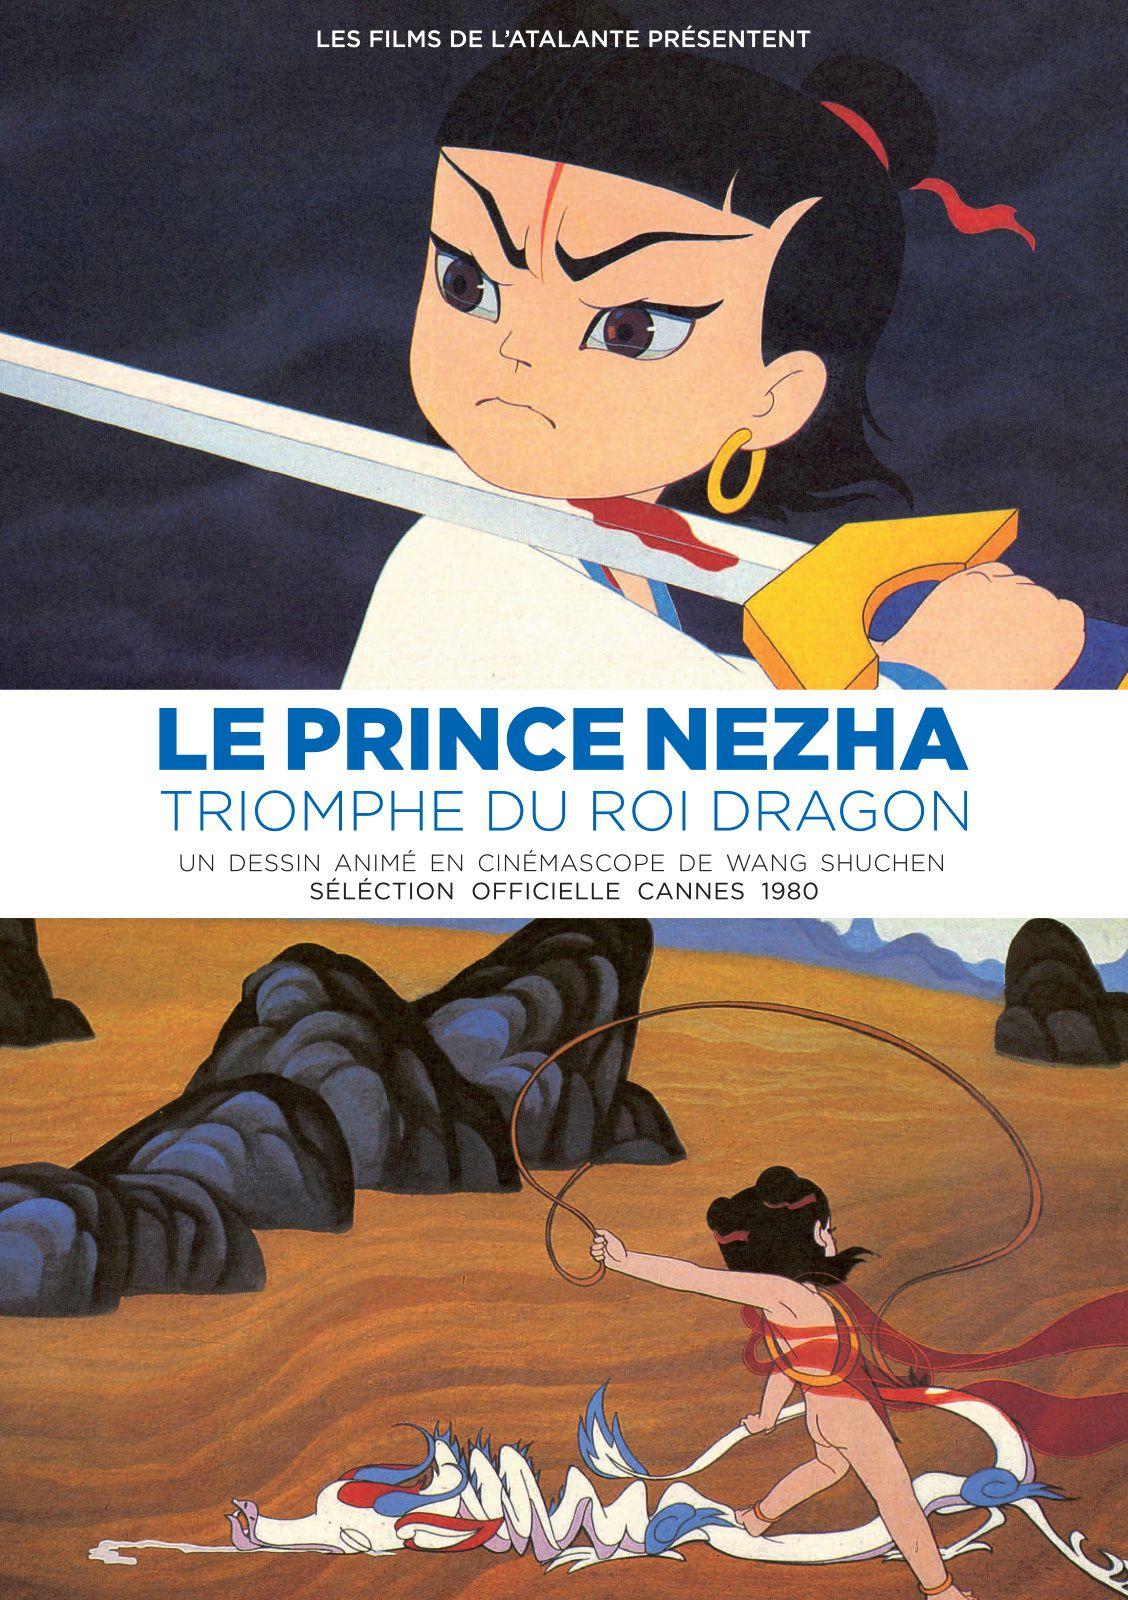 Le prince Nezha triomphe du roi dragon - Film (1979)